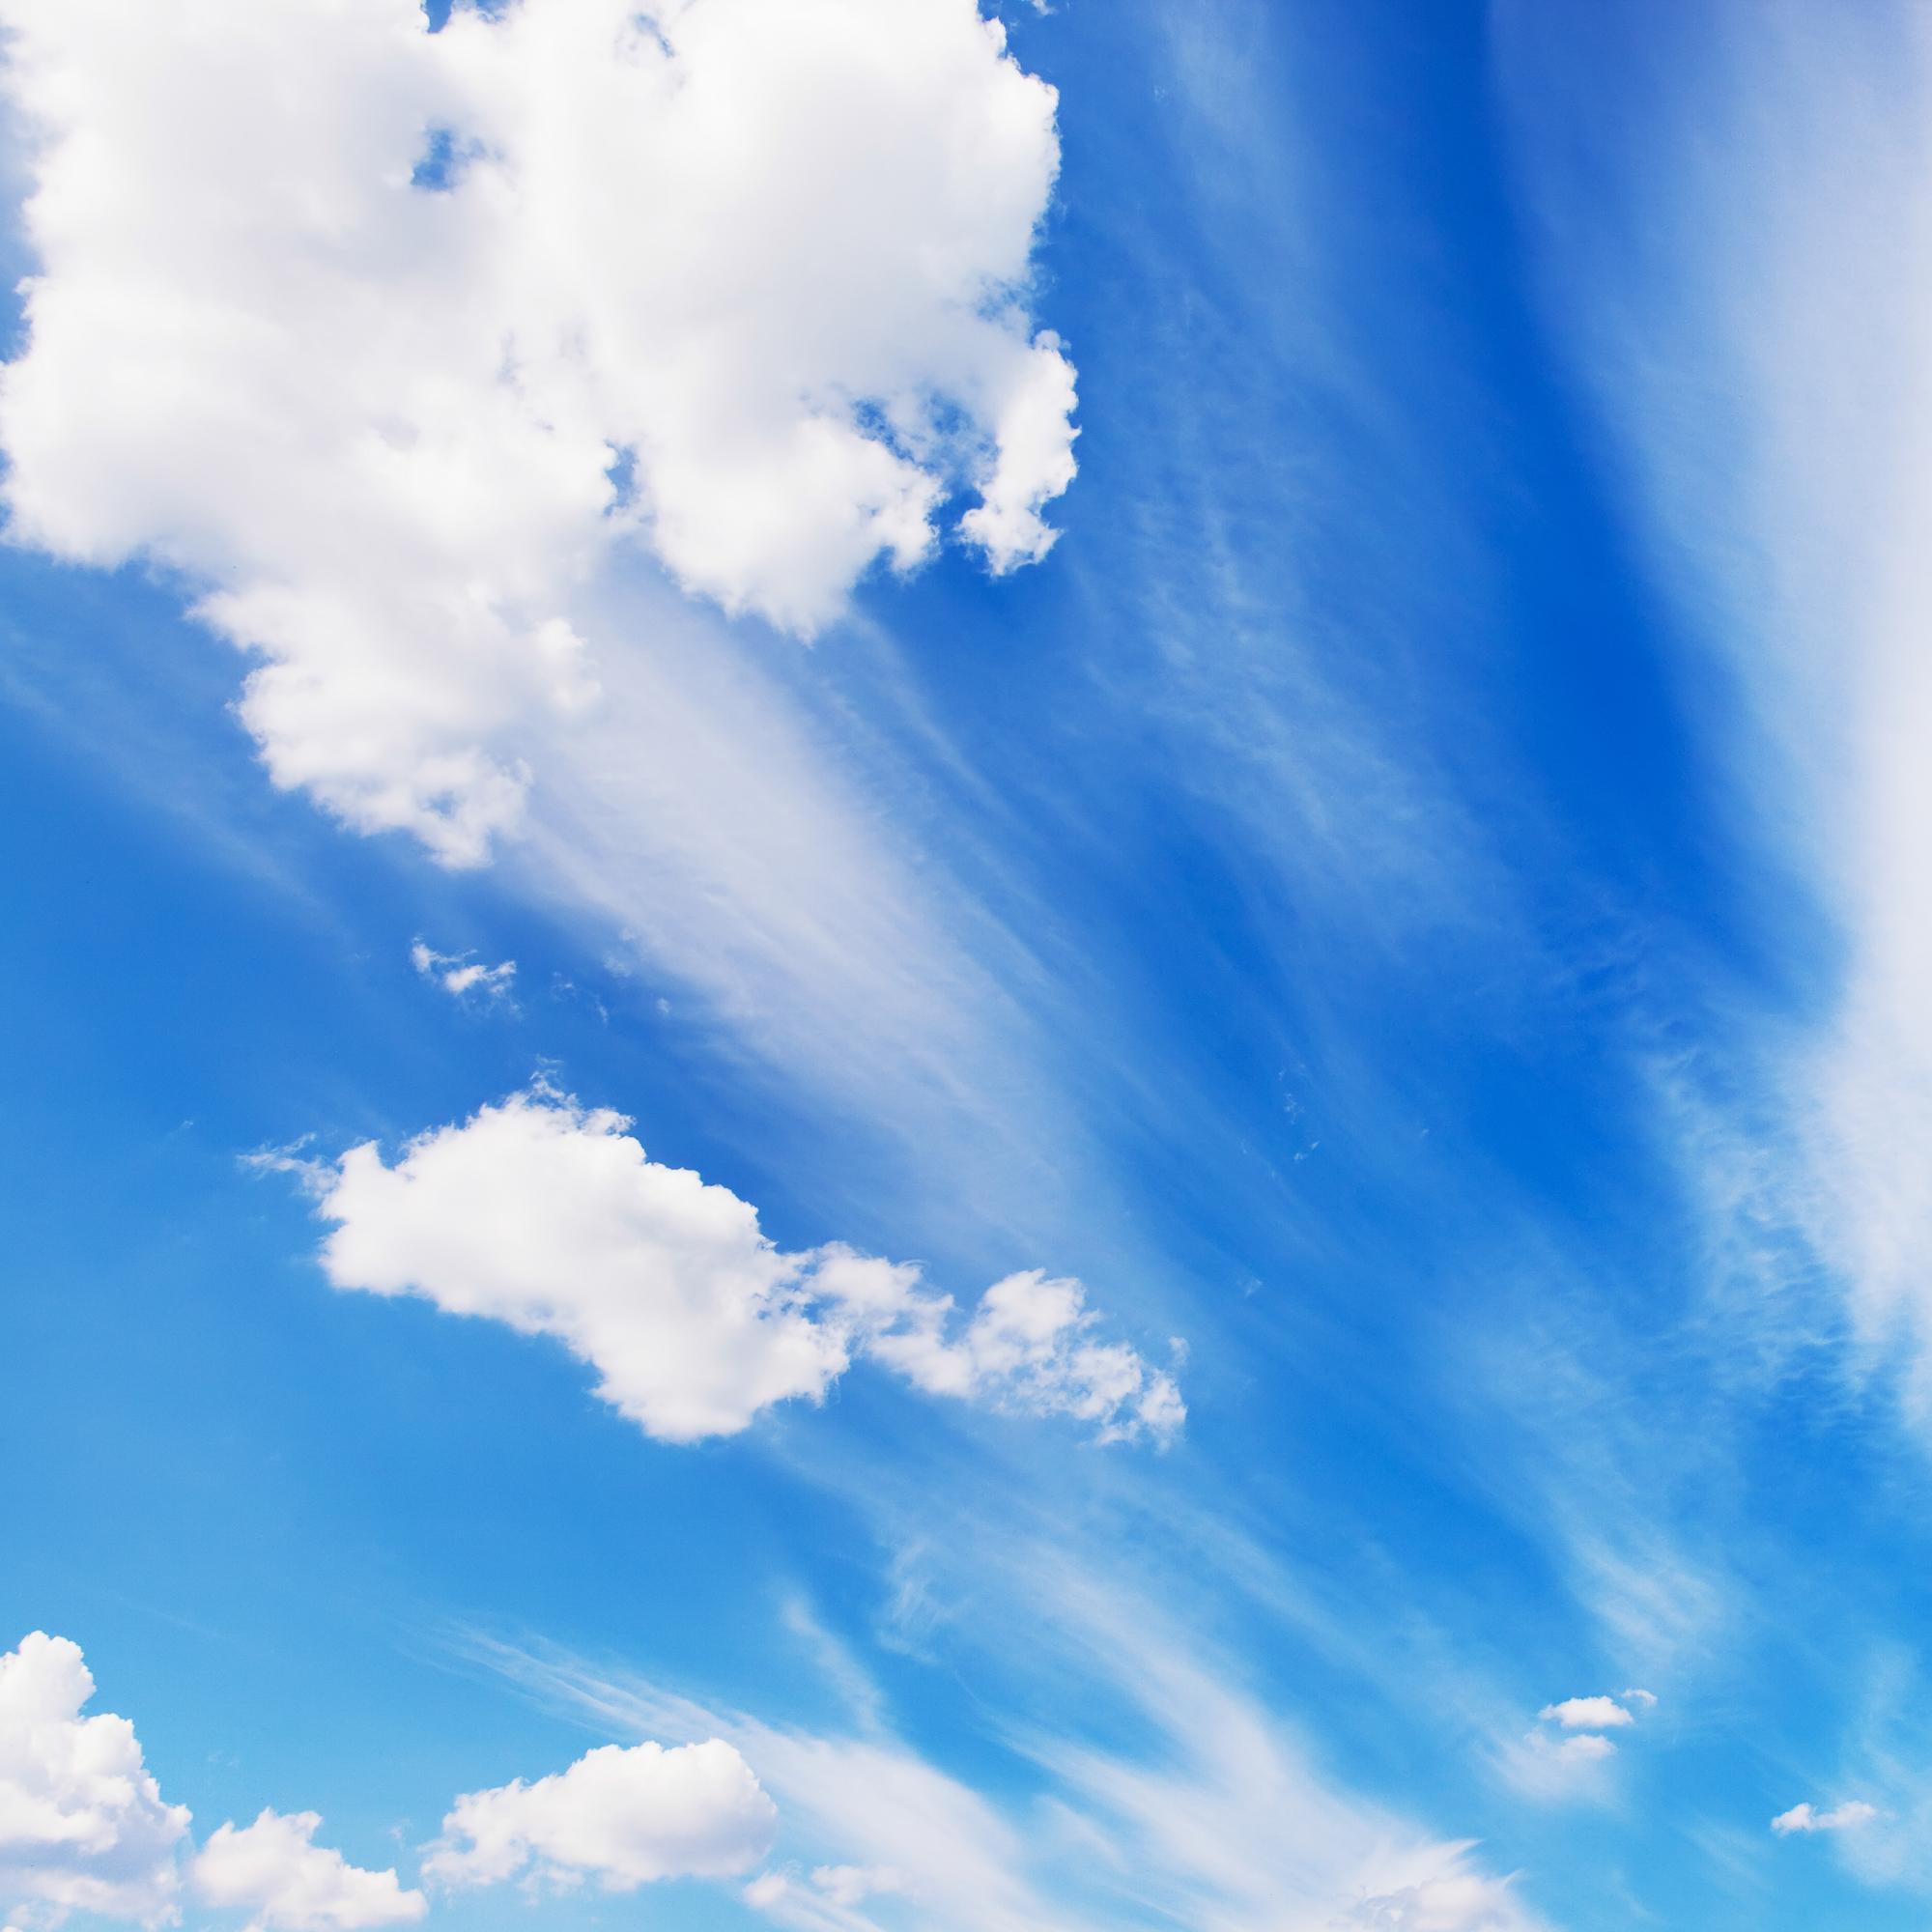 Blue Sky, Skies, Sky, Heaven, Cloudy, HQ Photo